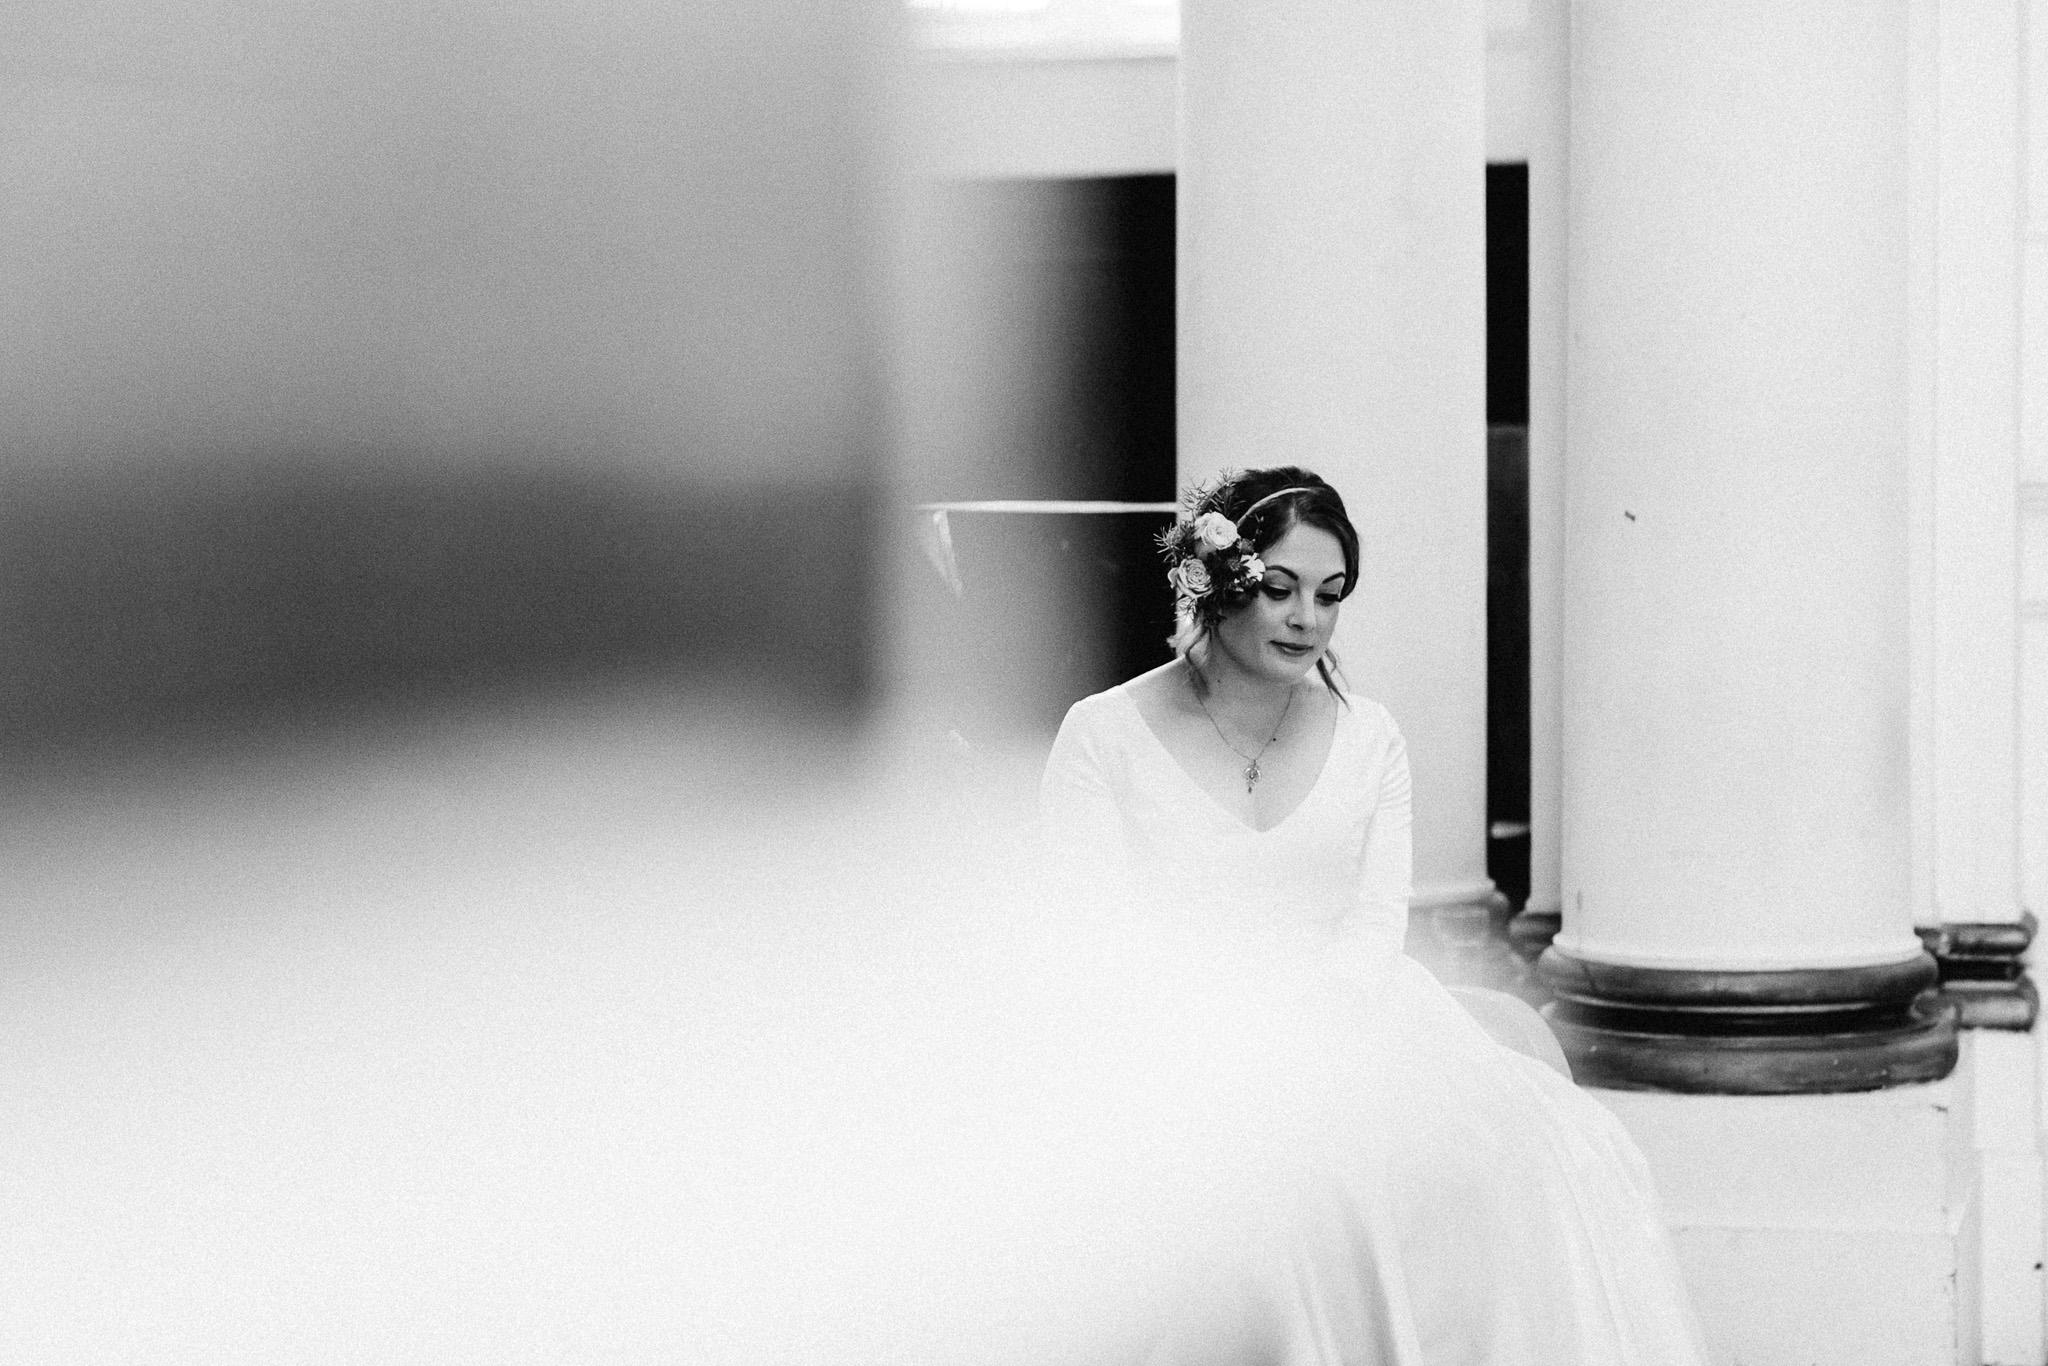 st_andrews_fabrica_brighton_wedding_561.jpg